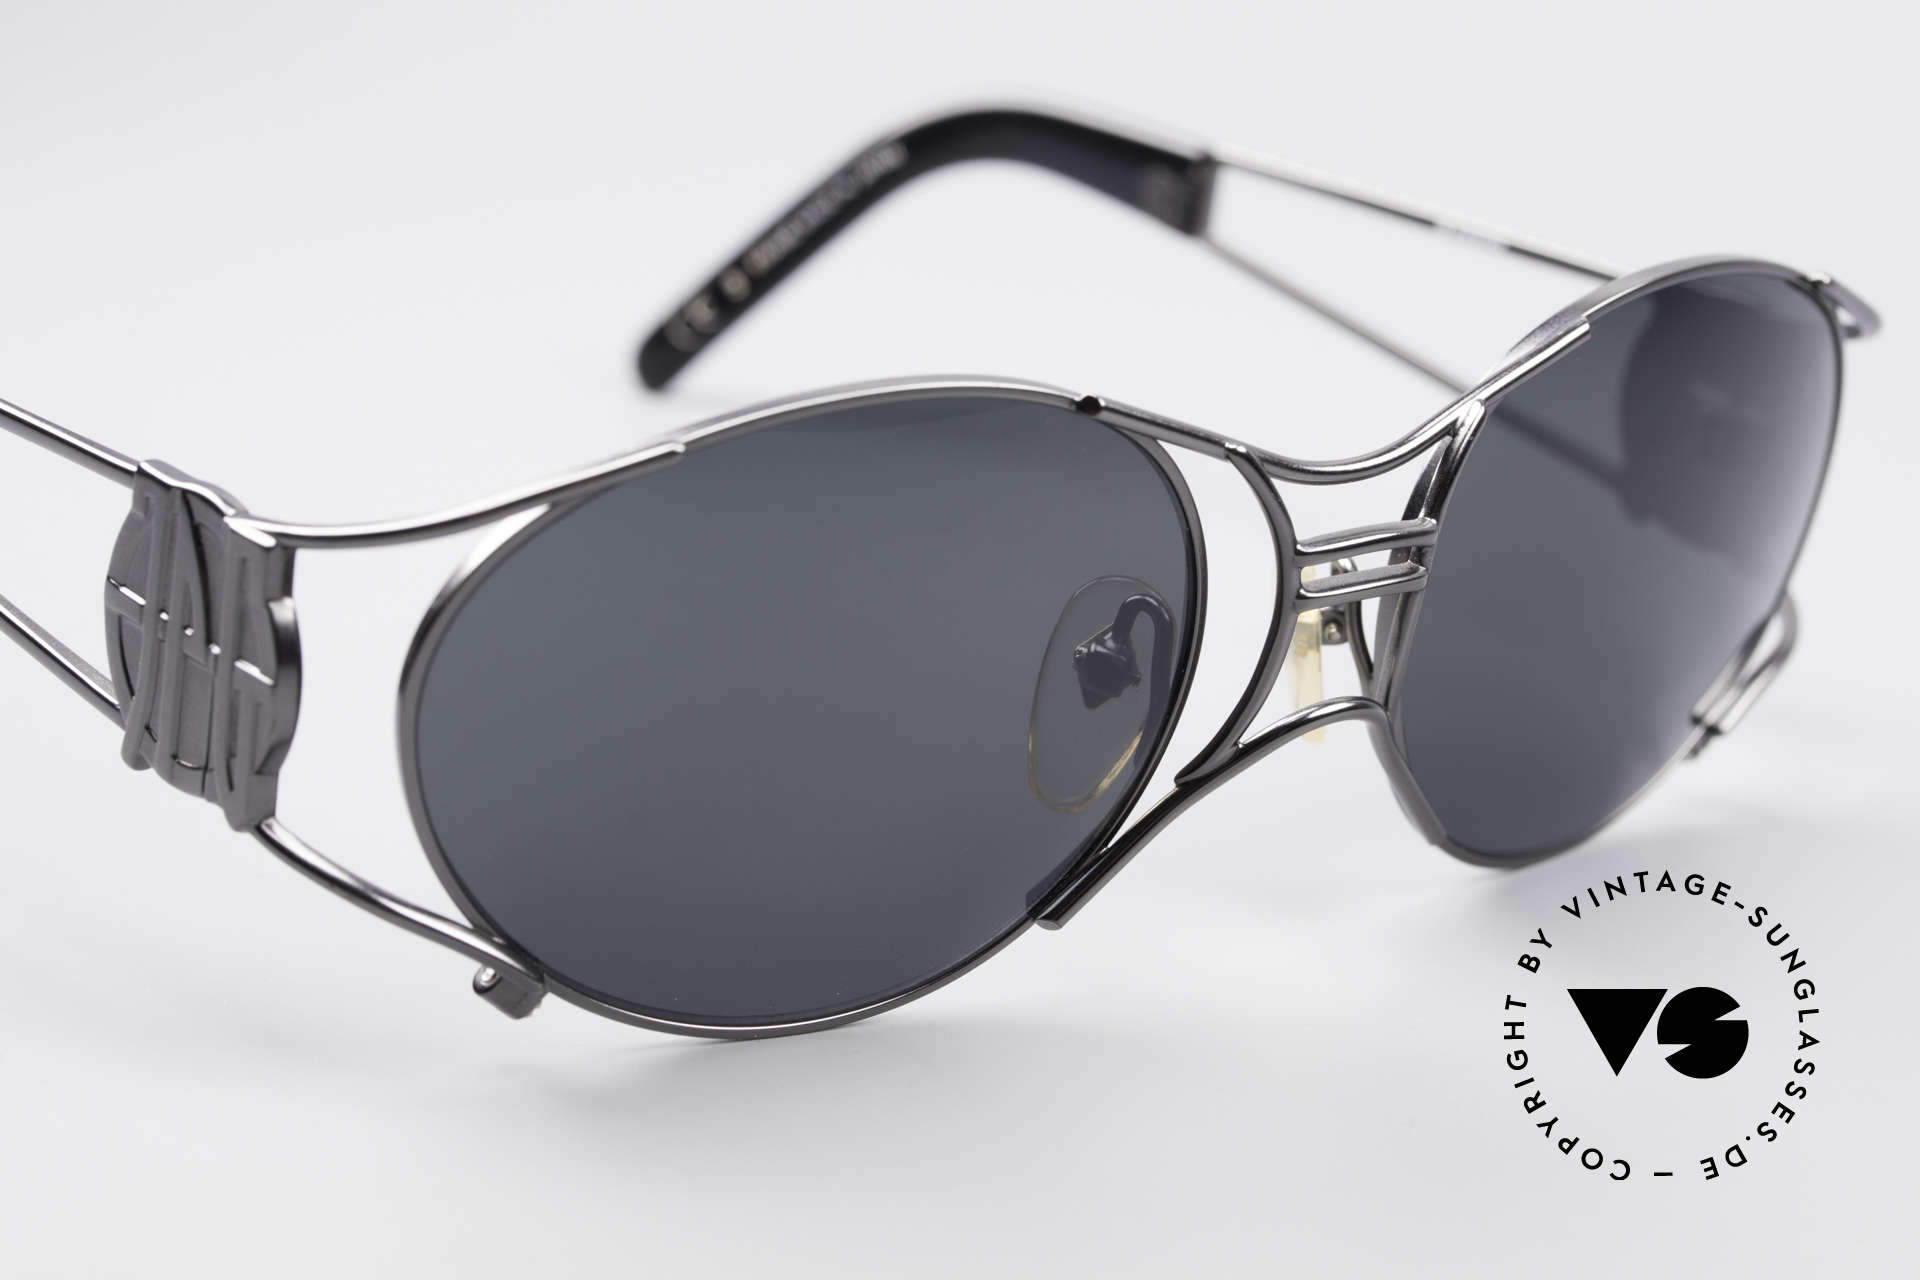 Jean Paul Gaultier 58-6101 Steampunk 90's Sunglasses, unworn original (collector's item & true eye-catcher), Made for Men and Women